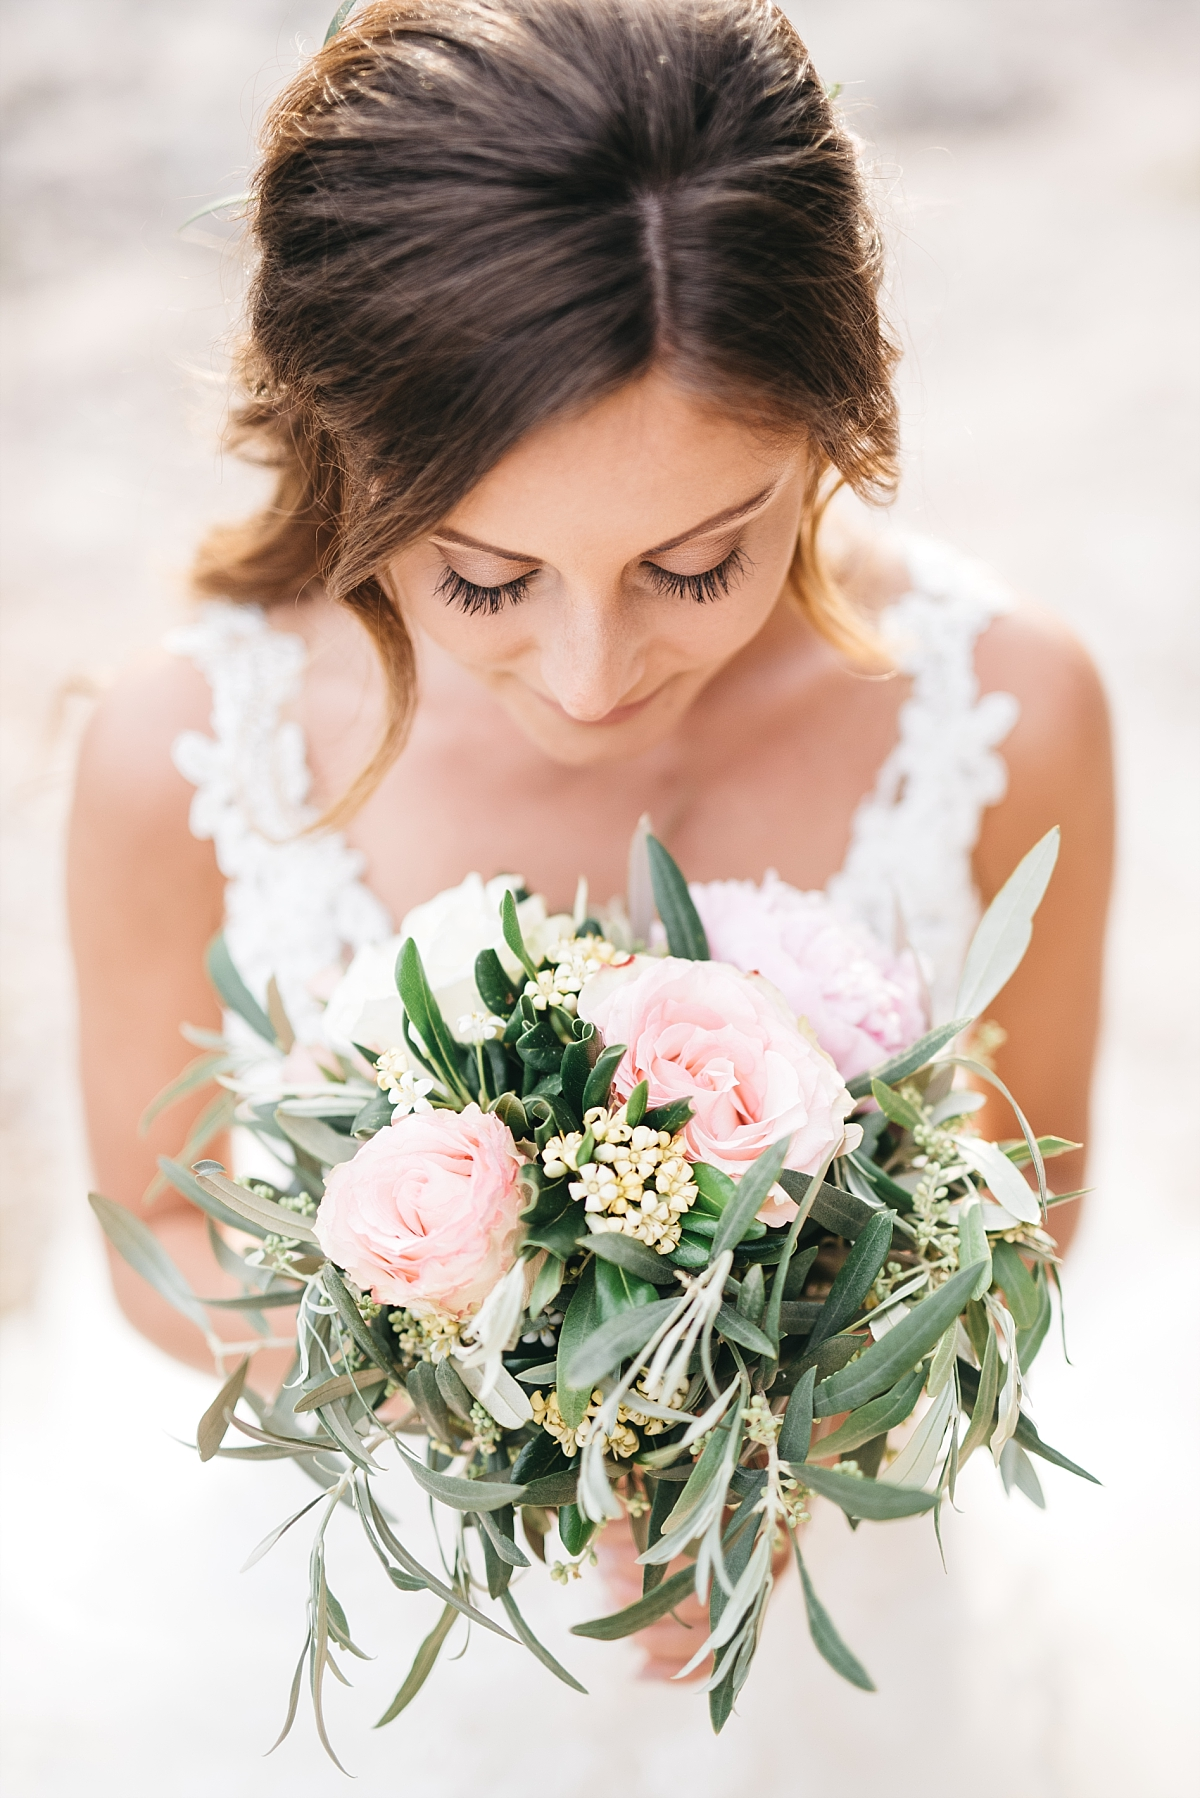 20170428-After-Wedding-Mallorca-Hochzeit-Hochzeitsfotograf_Julia-Daniel_Blog-0024